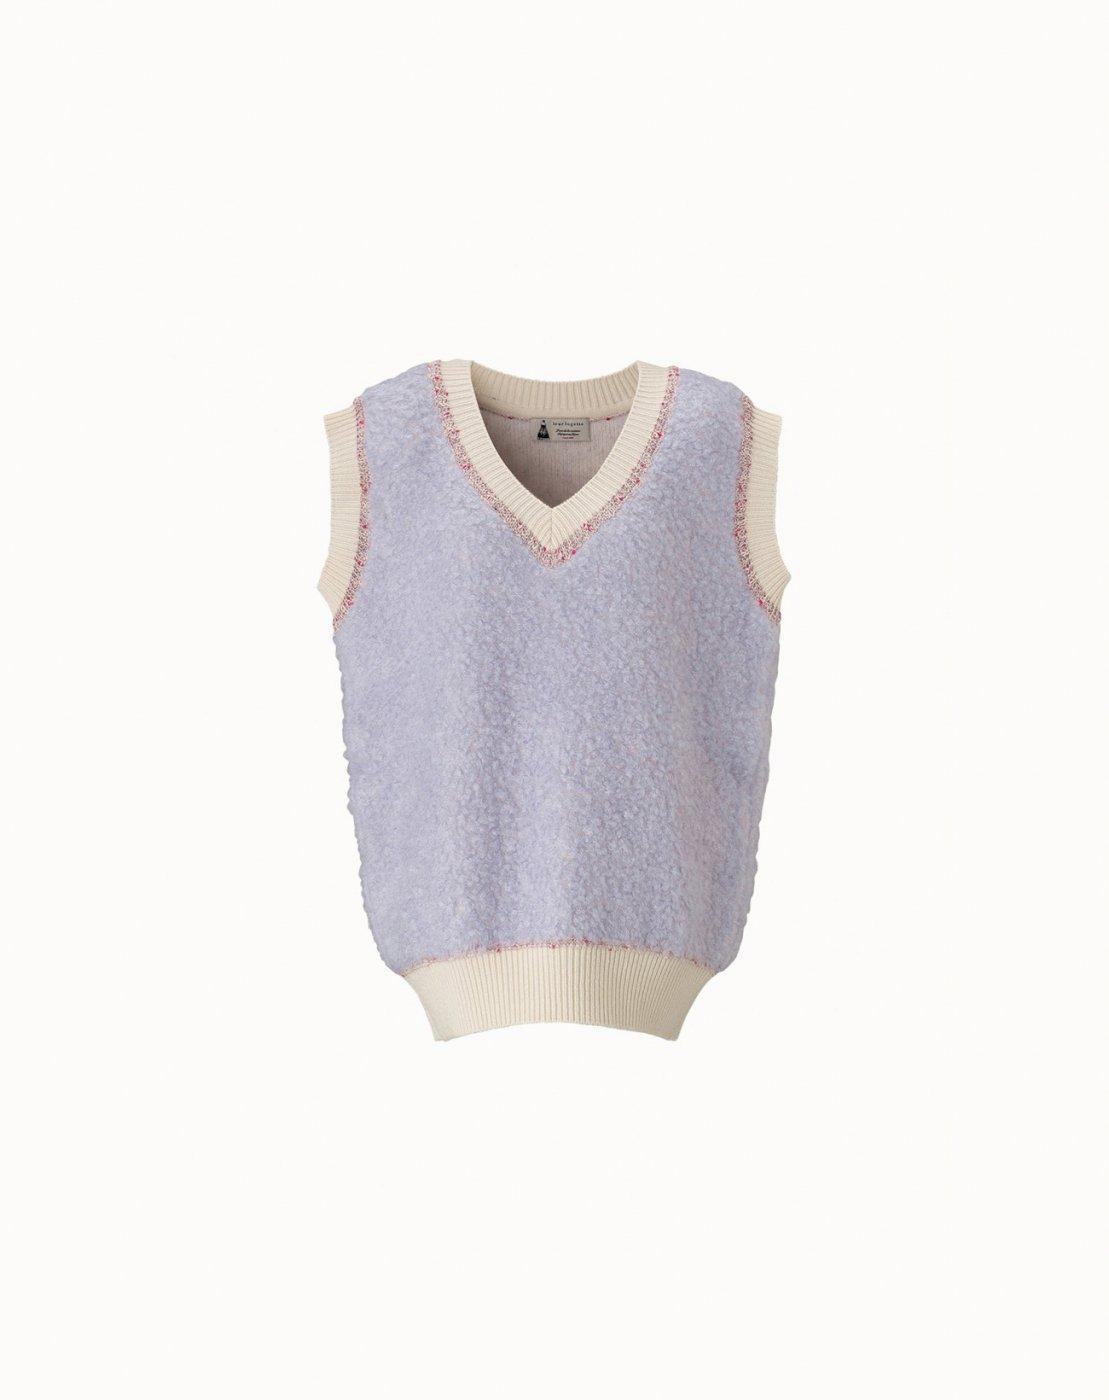 leur logette - <img class='new_mark_img1' src='https://img.shop-pro.jp/img/new/icons47.gif' style='border:none;display:inline;margin:0px;padding:0px;width:auto;' />【Maison leur logette】Mohair Nylon Vest - Lavender